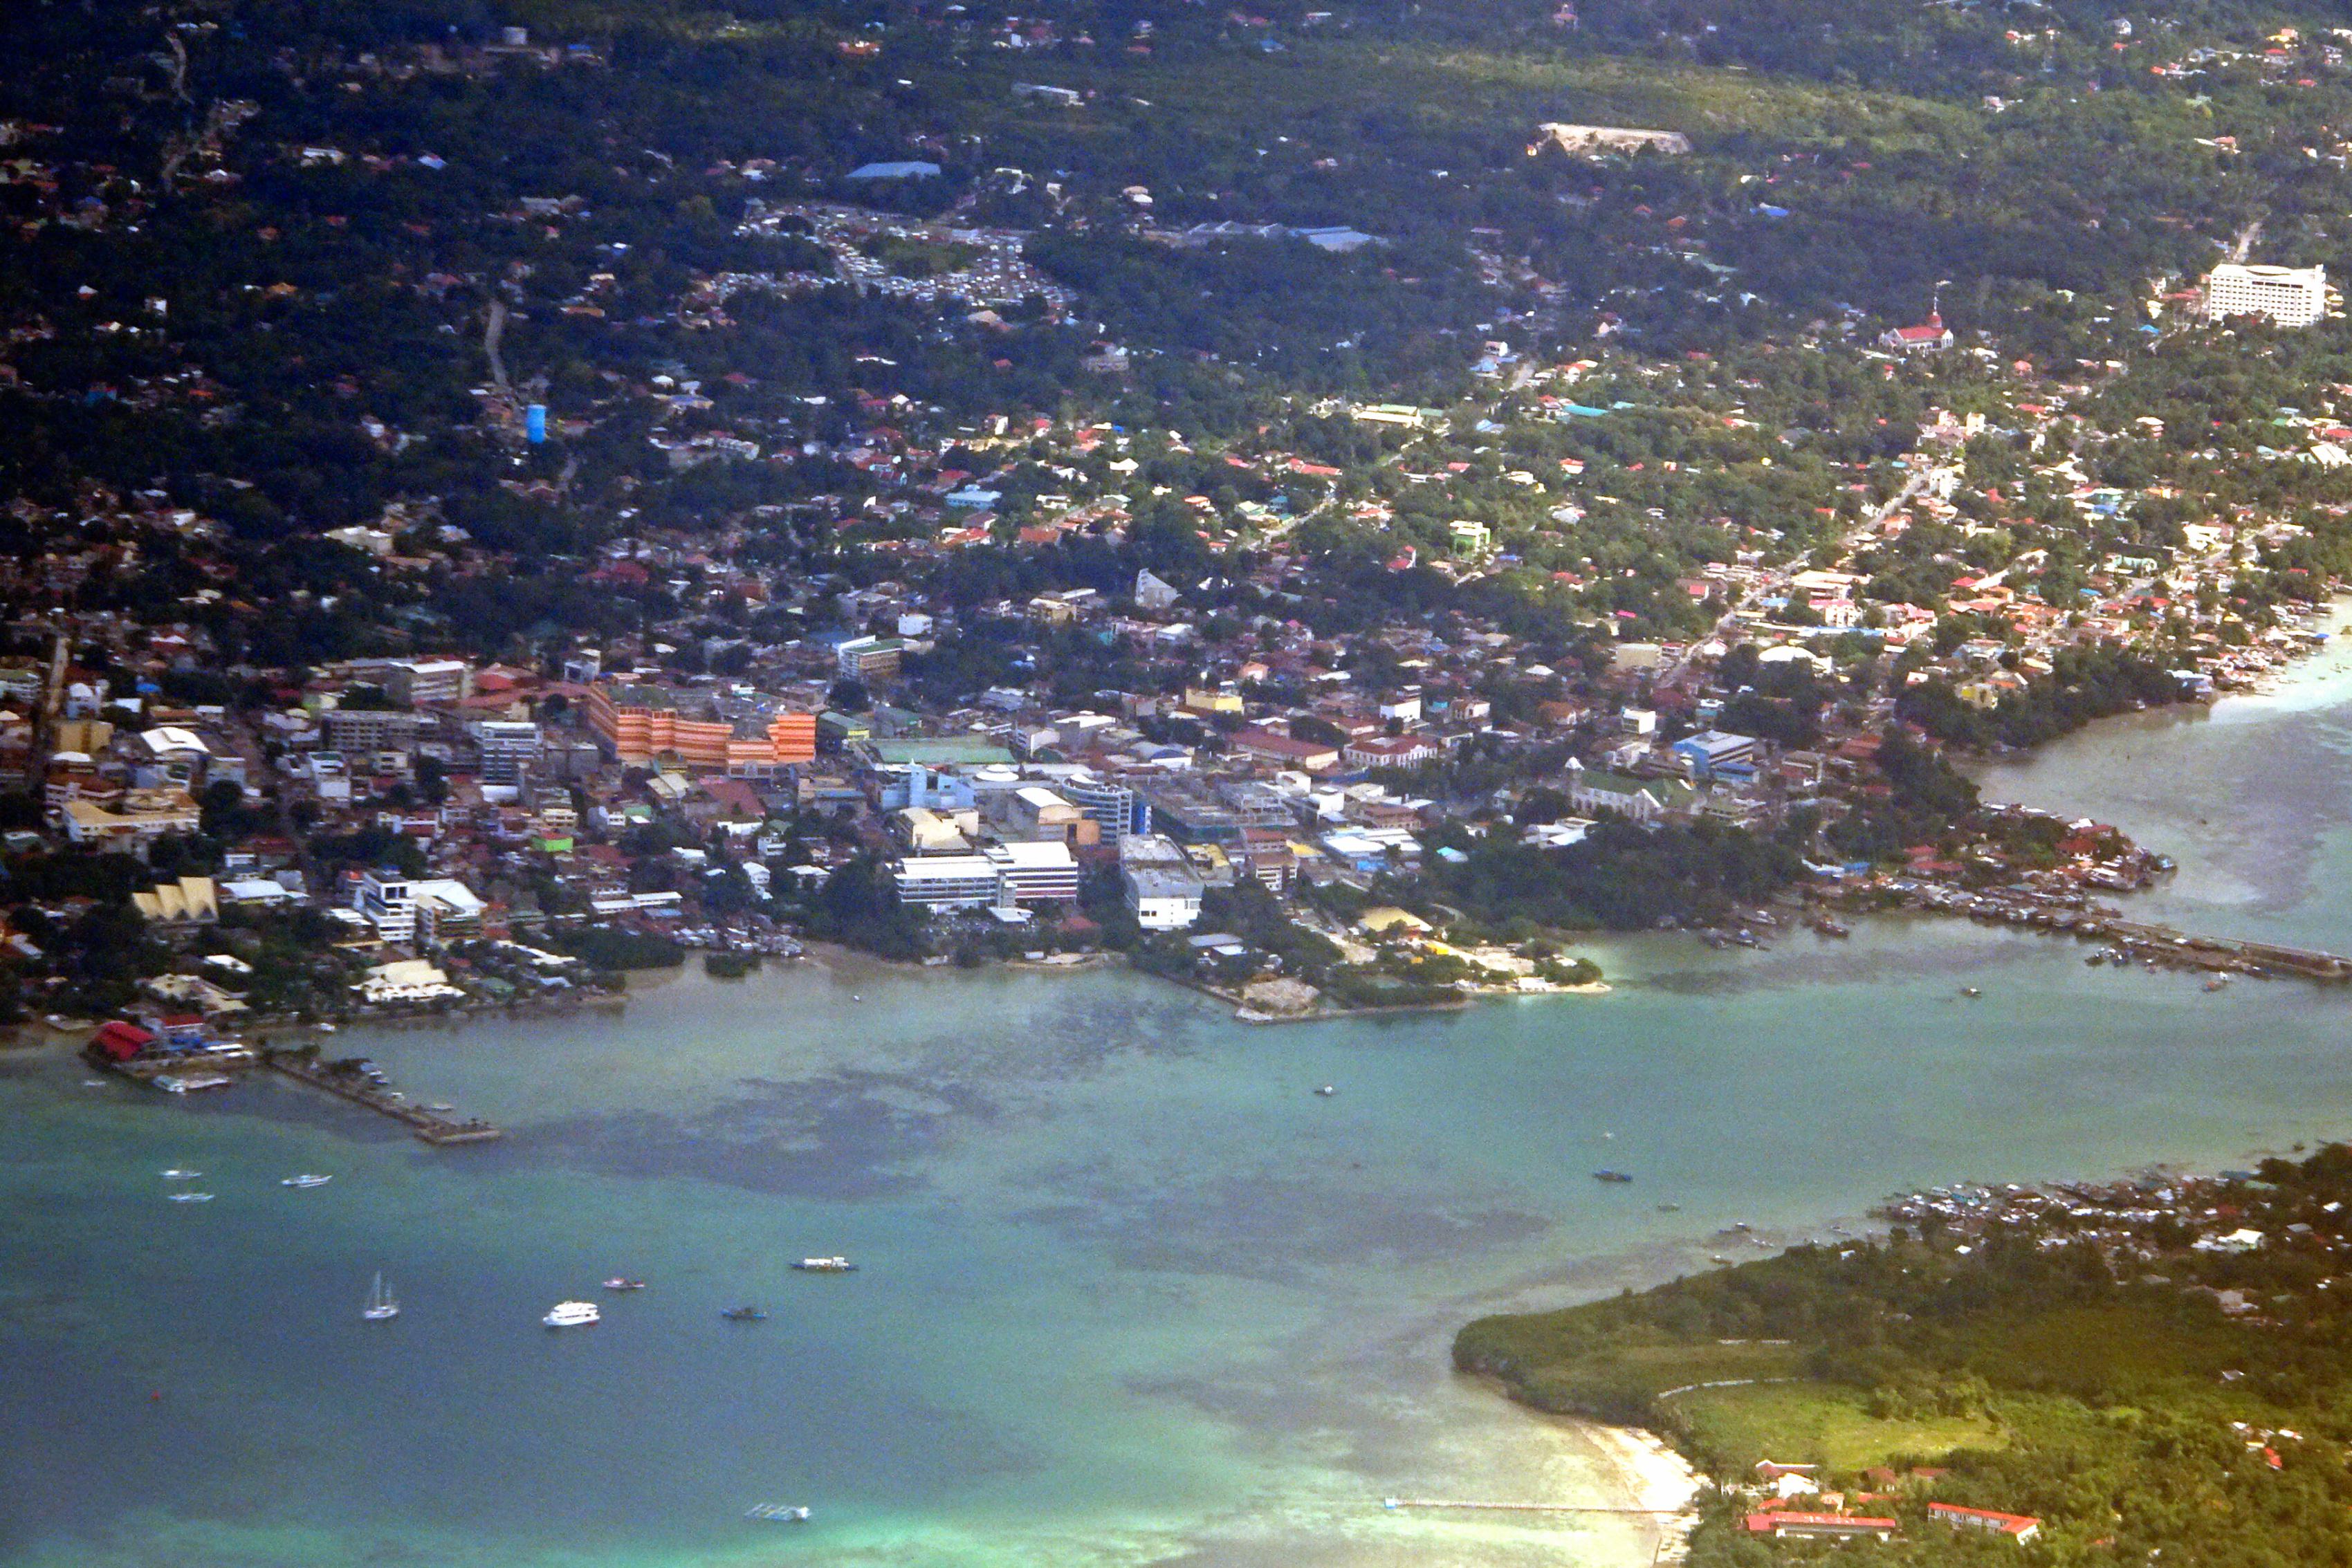 An aerial view of Tagbilaran City, Bohol